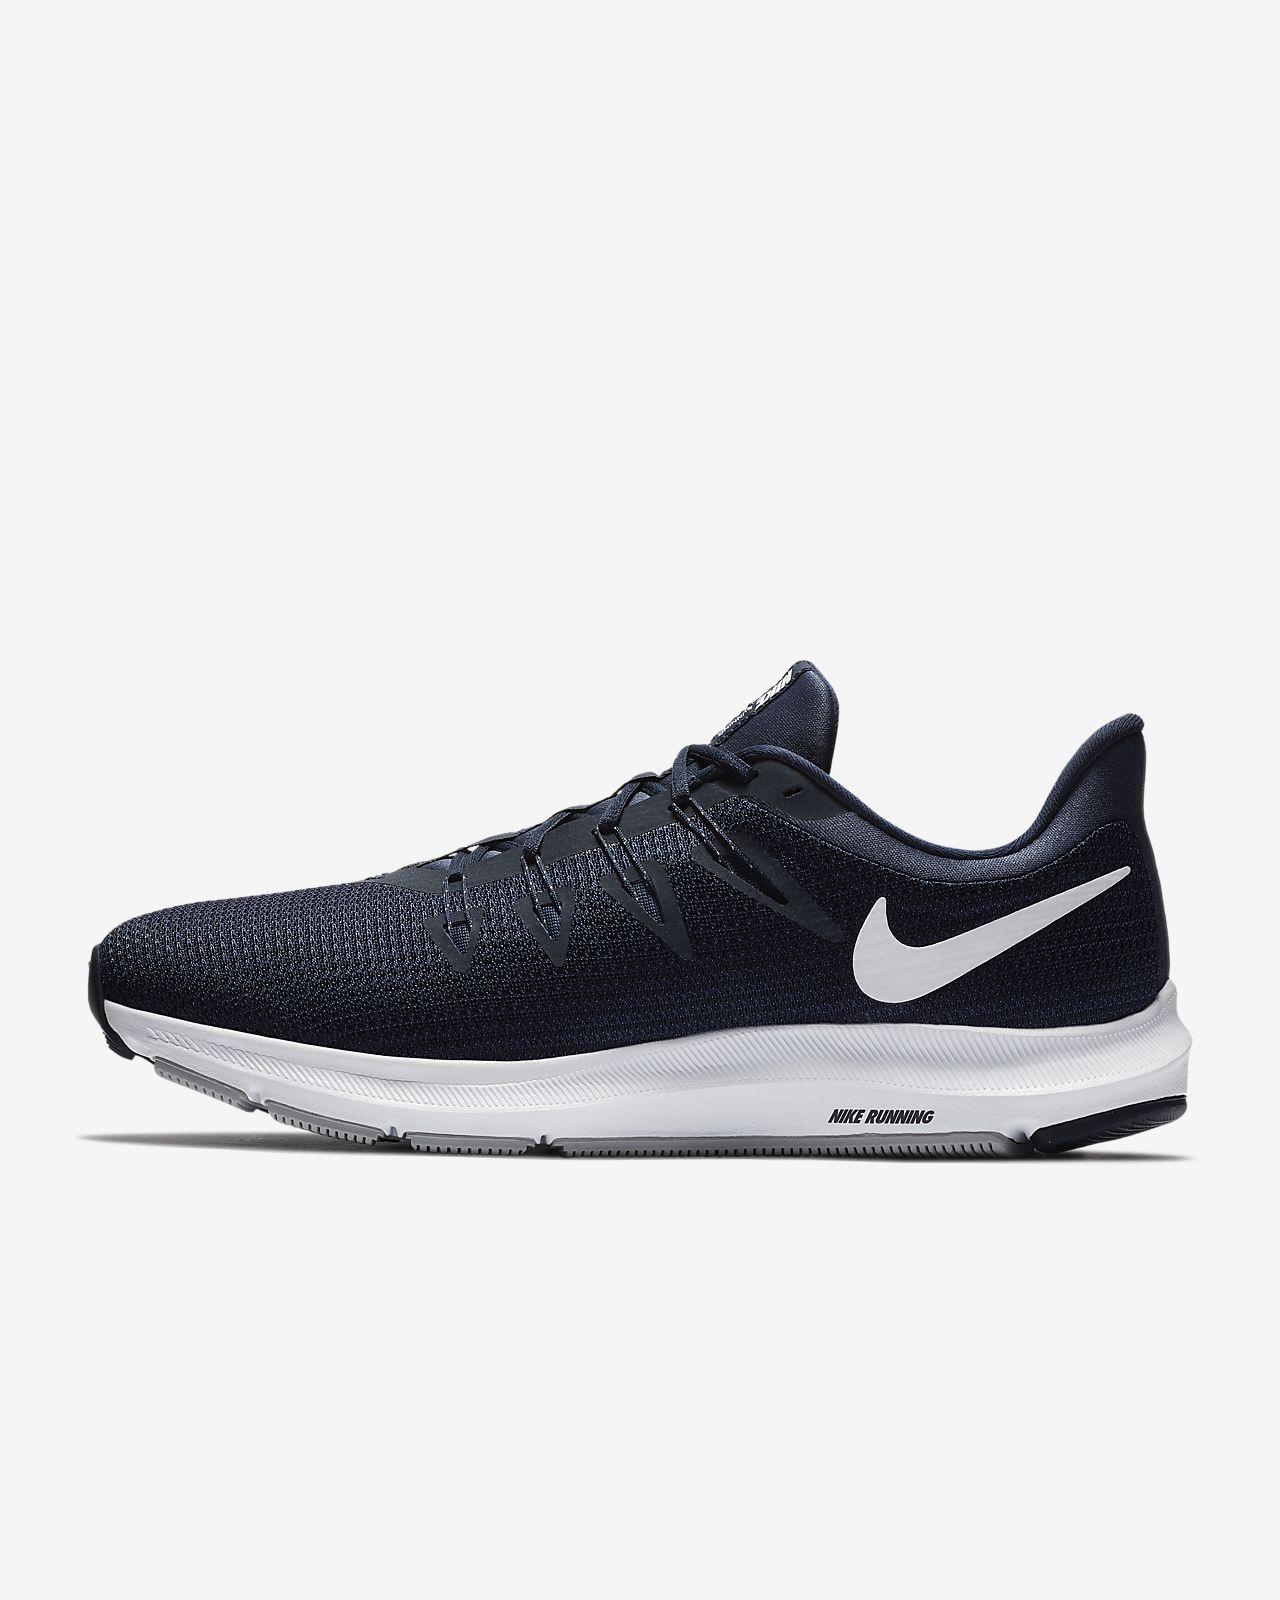 bb8d7f91090c8 Nike Quest Men s Running Shoe. Nike.com BE